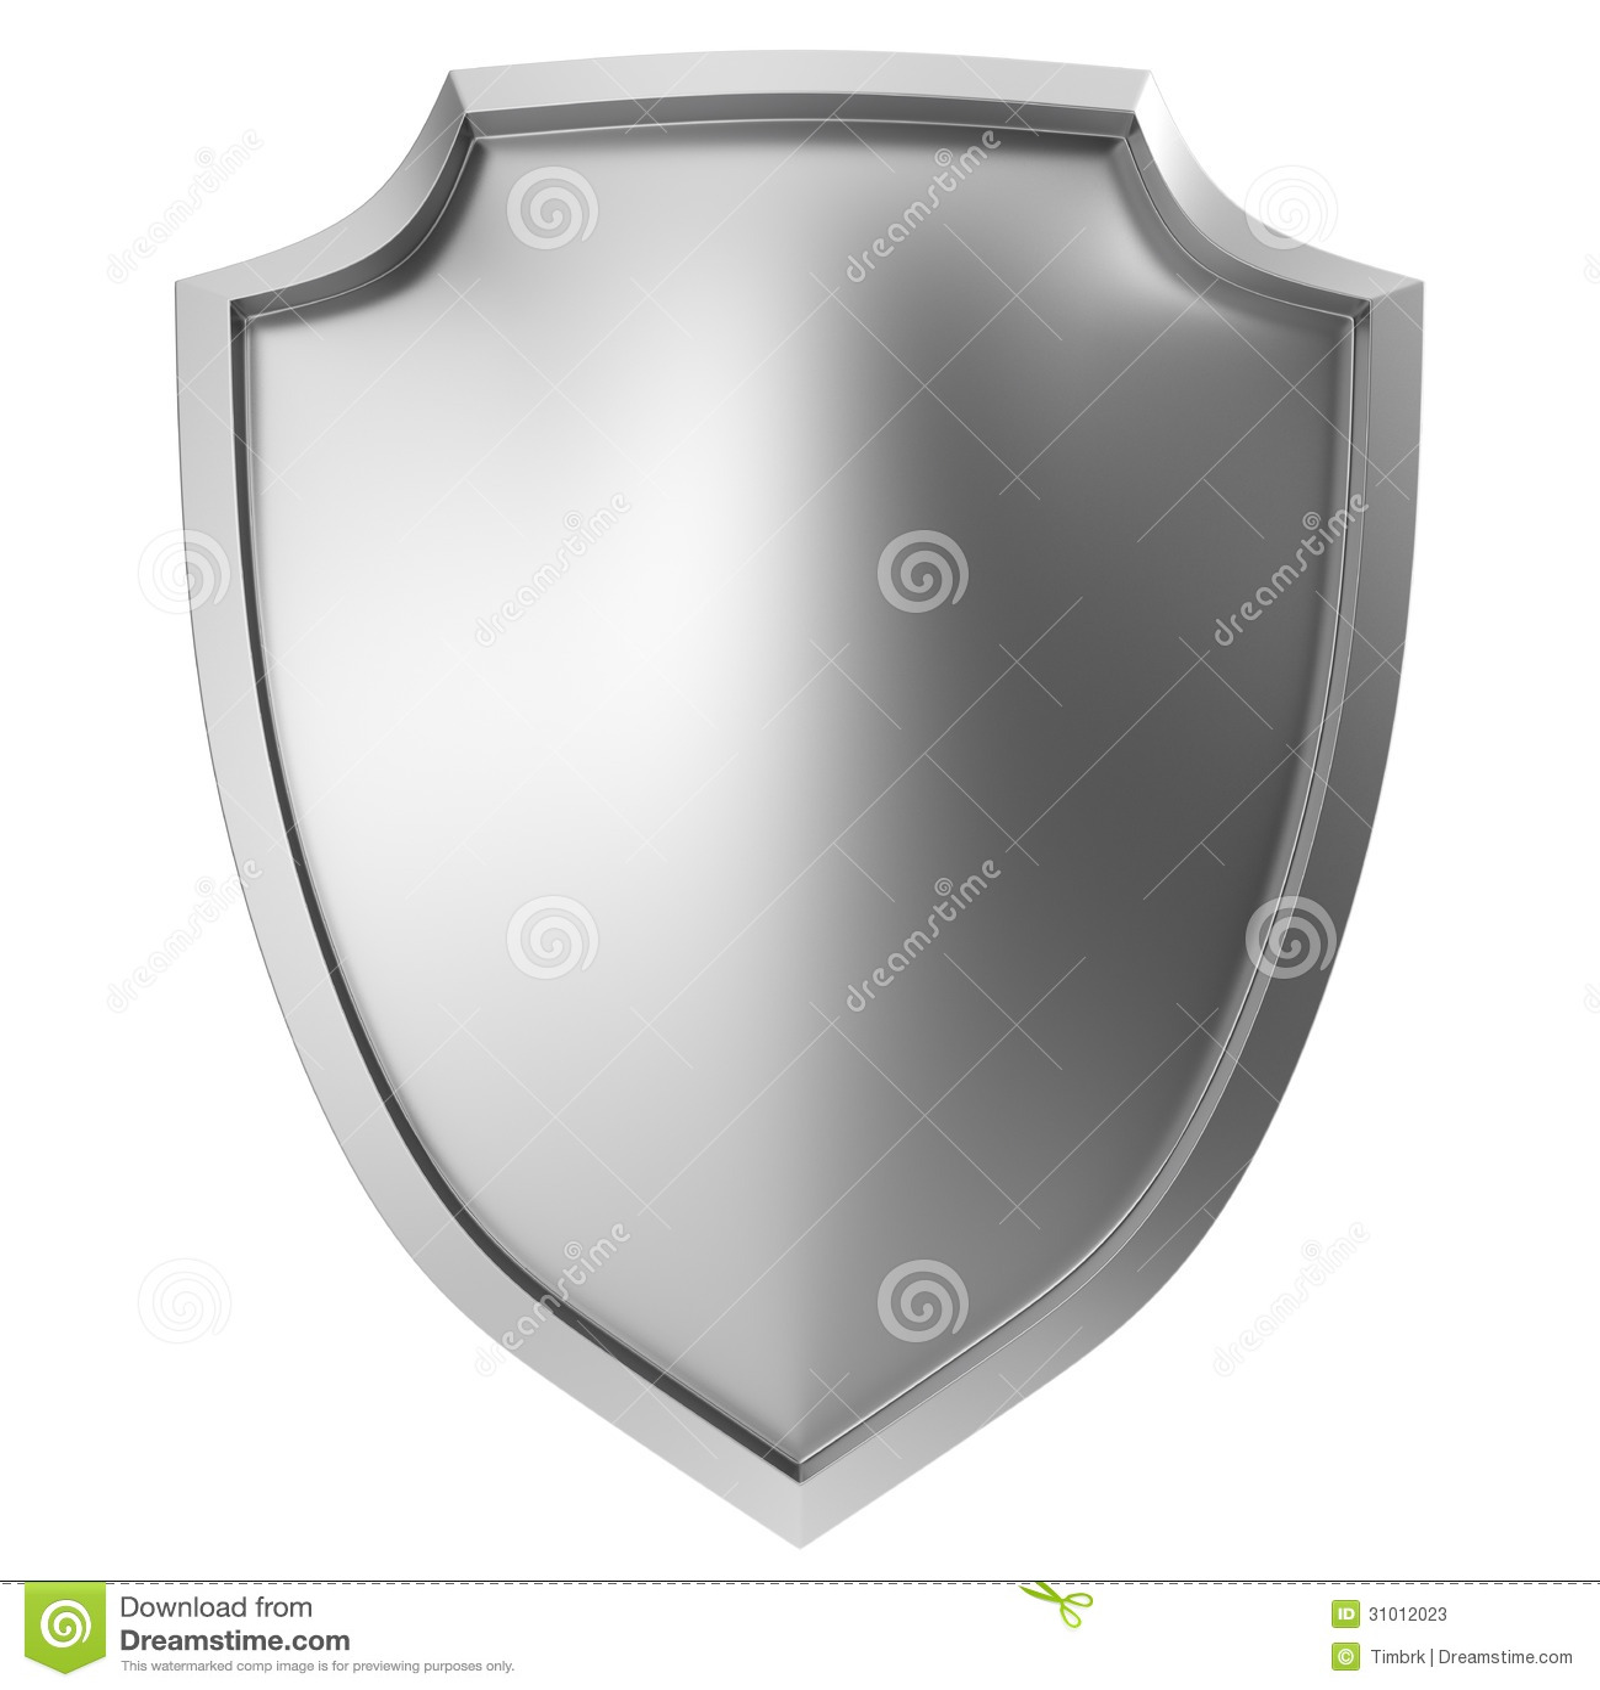 Blank metal shield